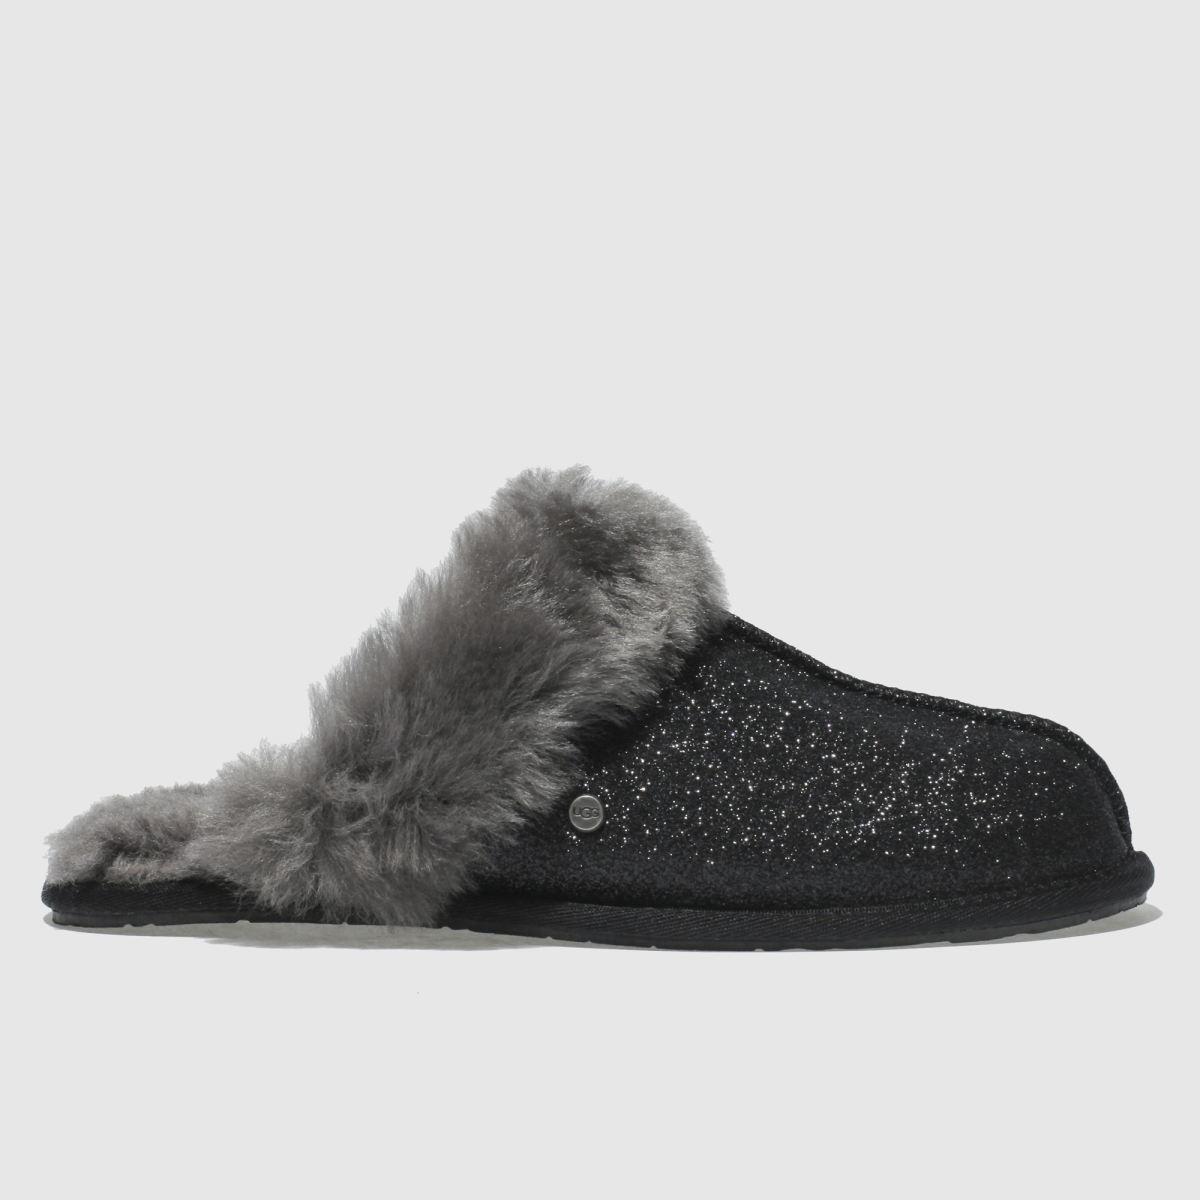 Ugg Black Scuffette Ii Sparkle Slippers